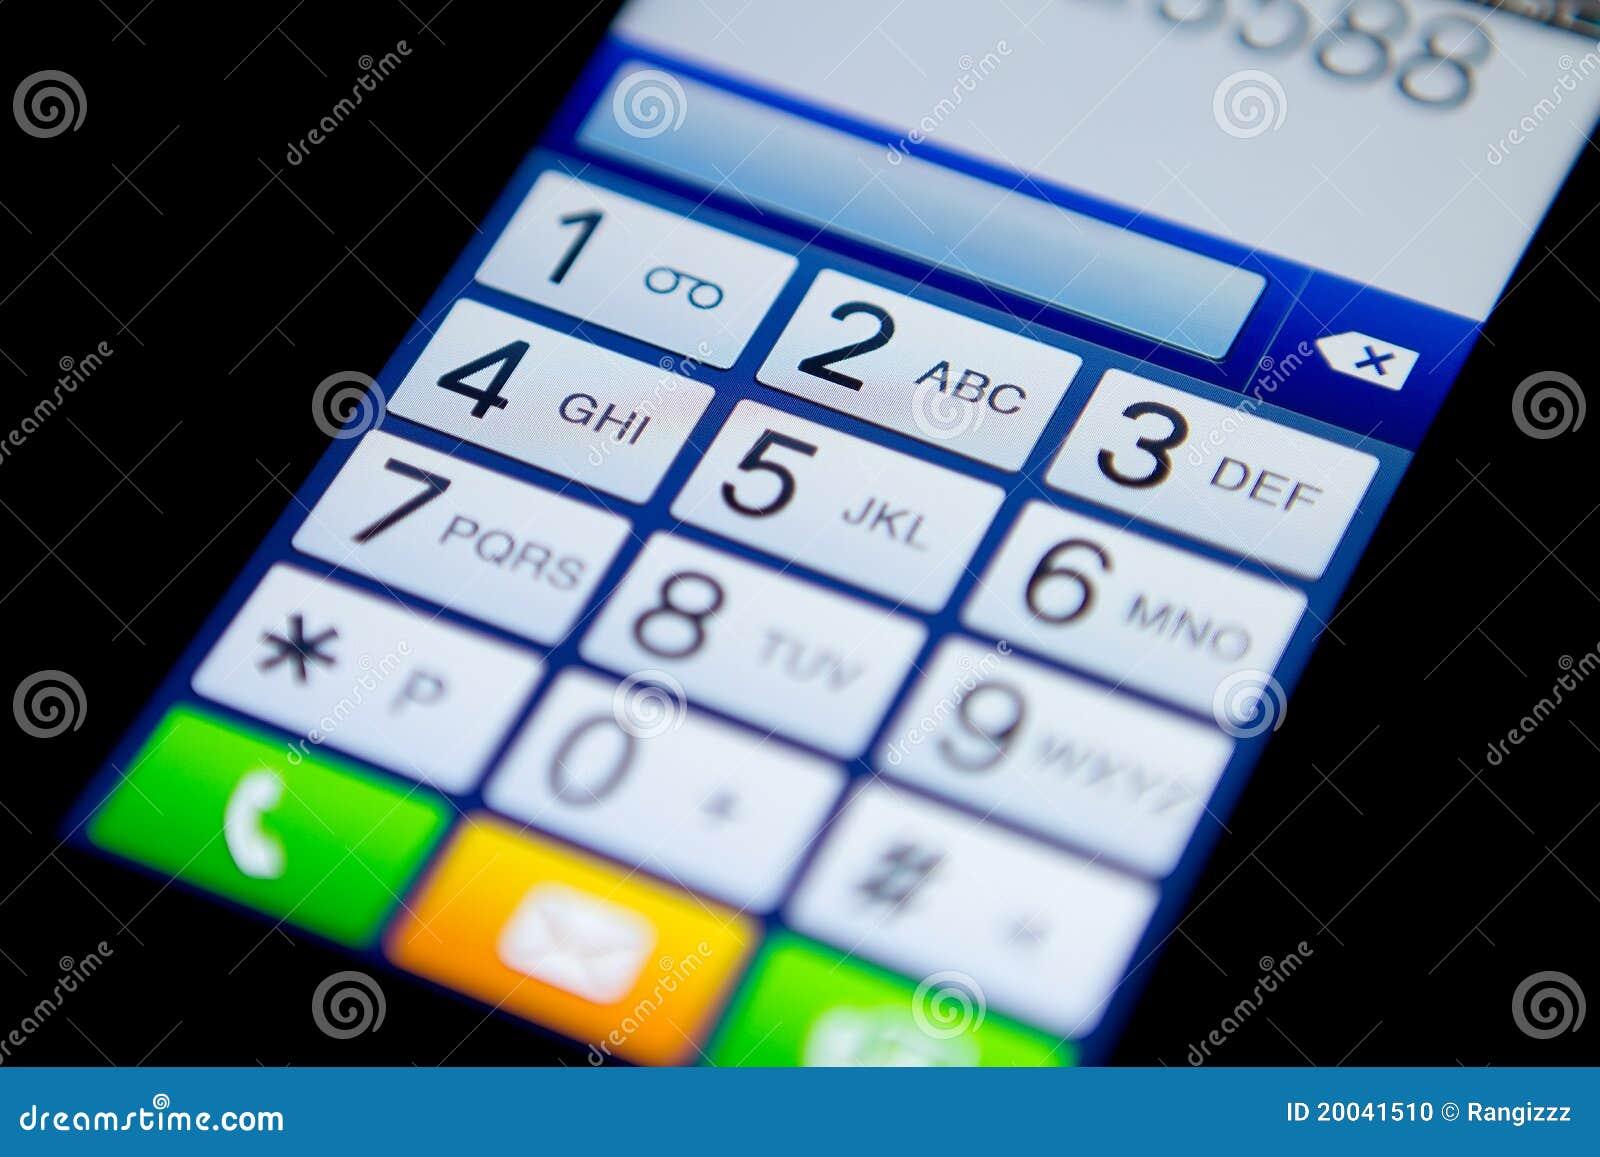 Mobile phone keypad stock photo. Image of computer, call - 20041510